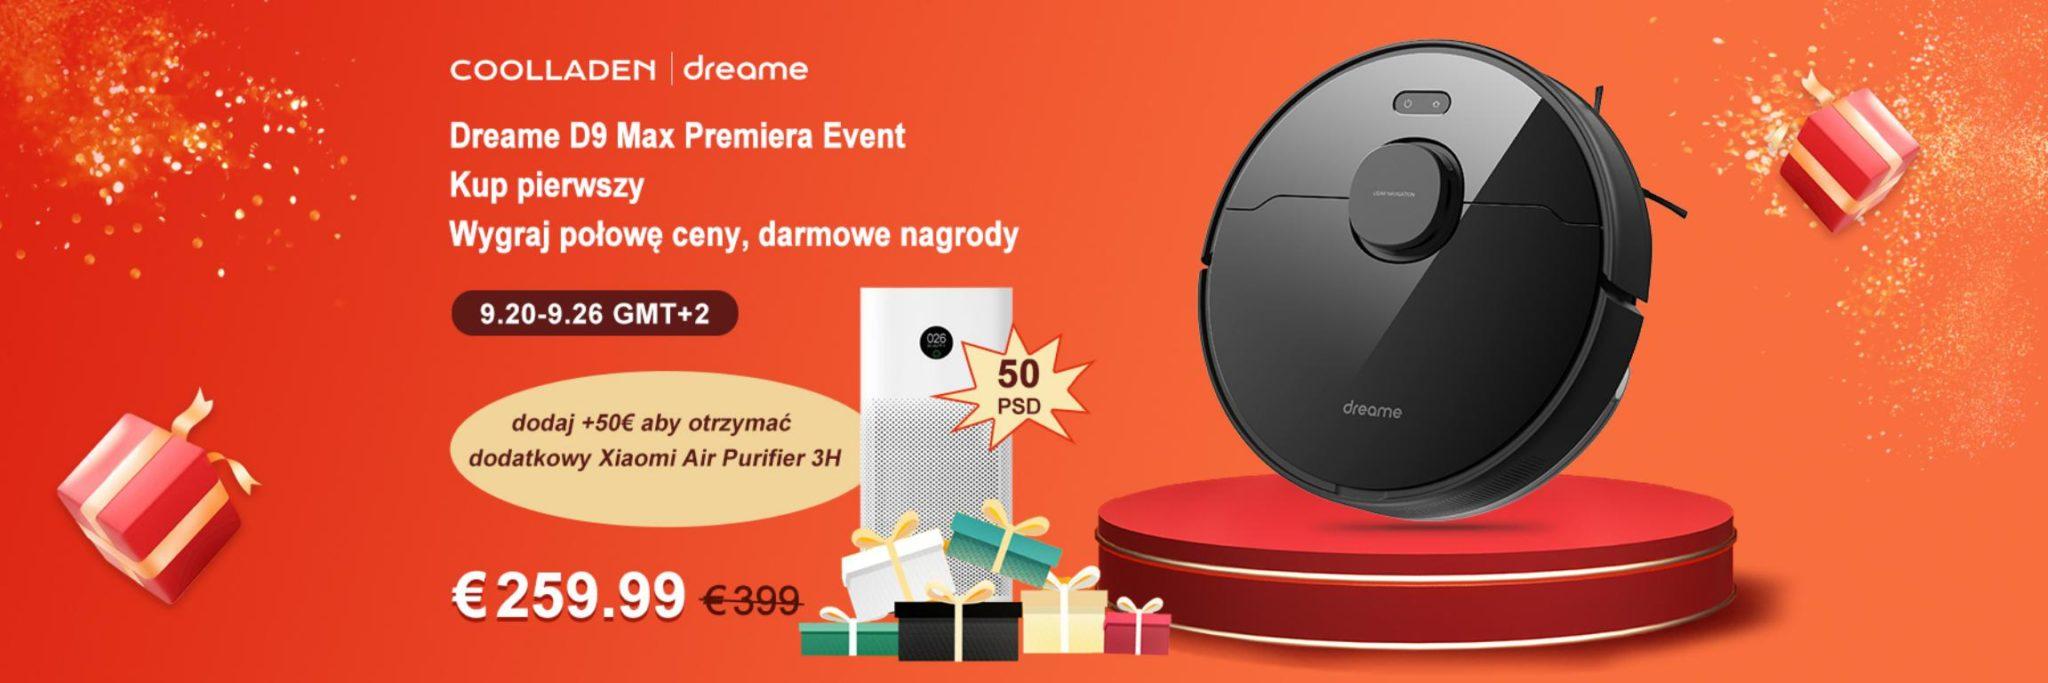 Promocja Dreame D9 Max - coolladen - banner